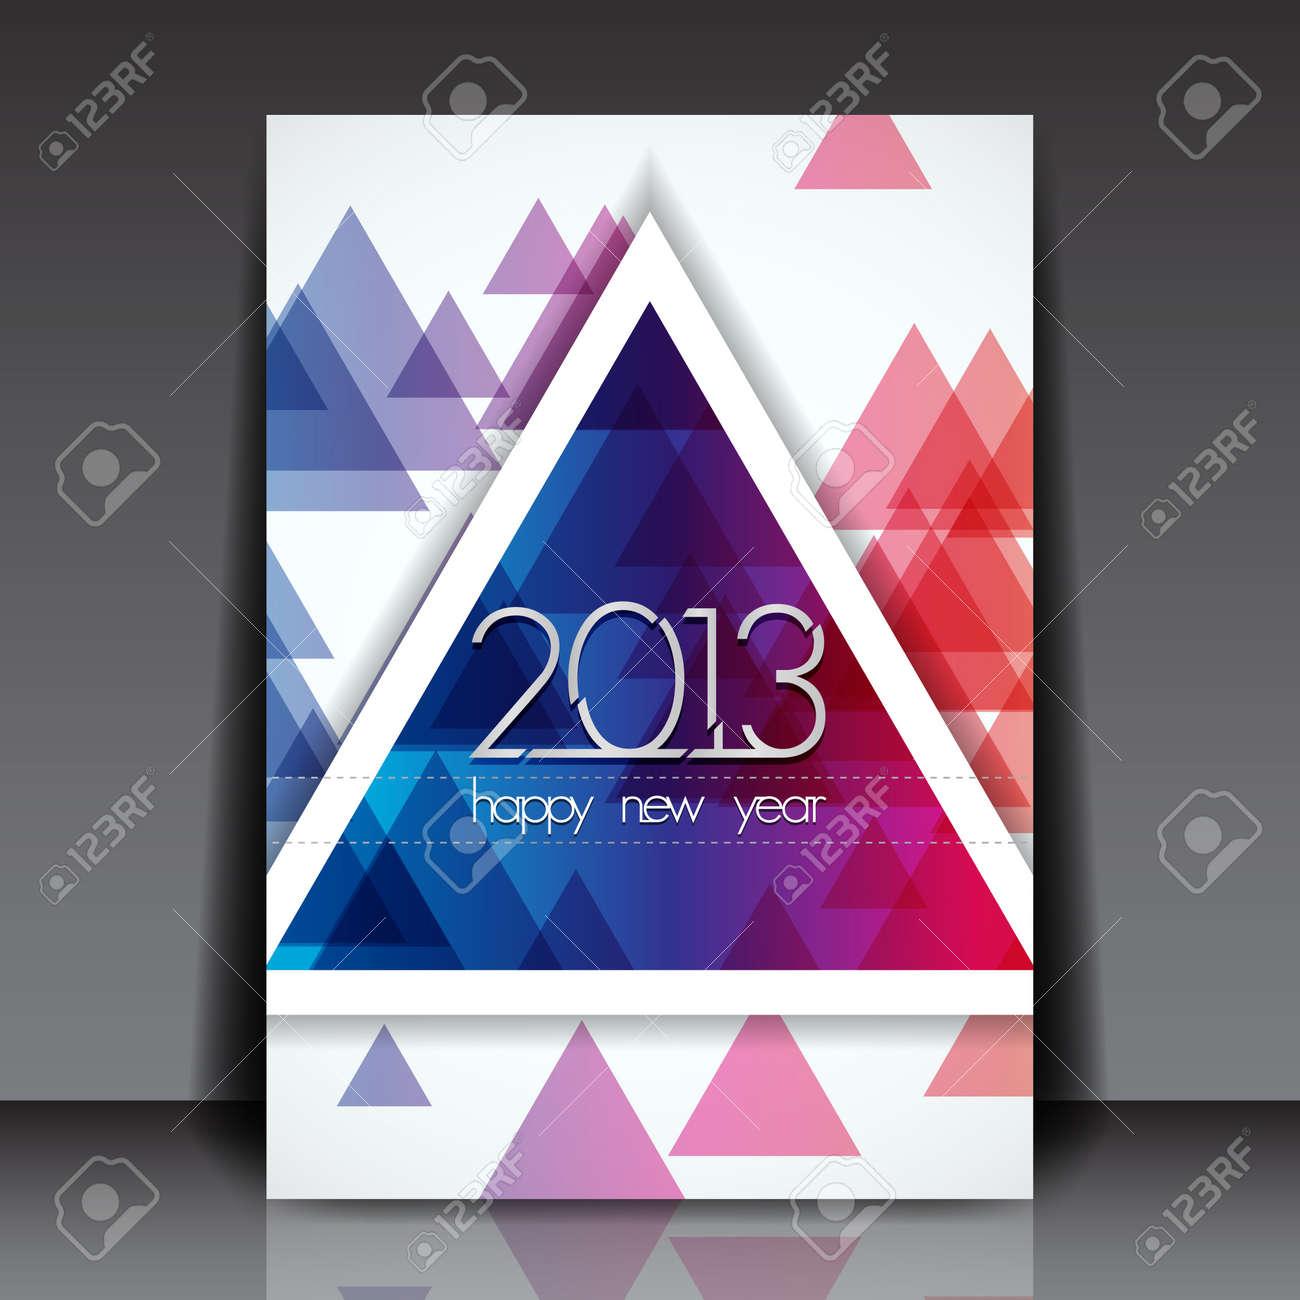 2013 New Year Editable Flyer Template Stock Vector - 15775554